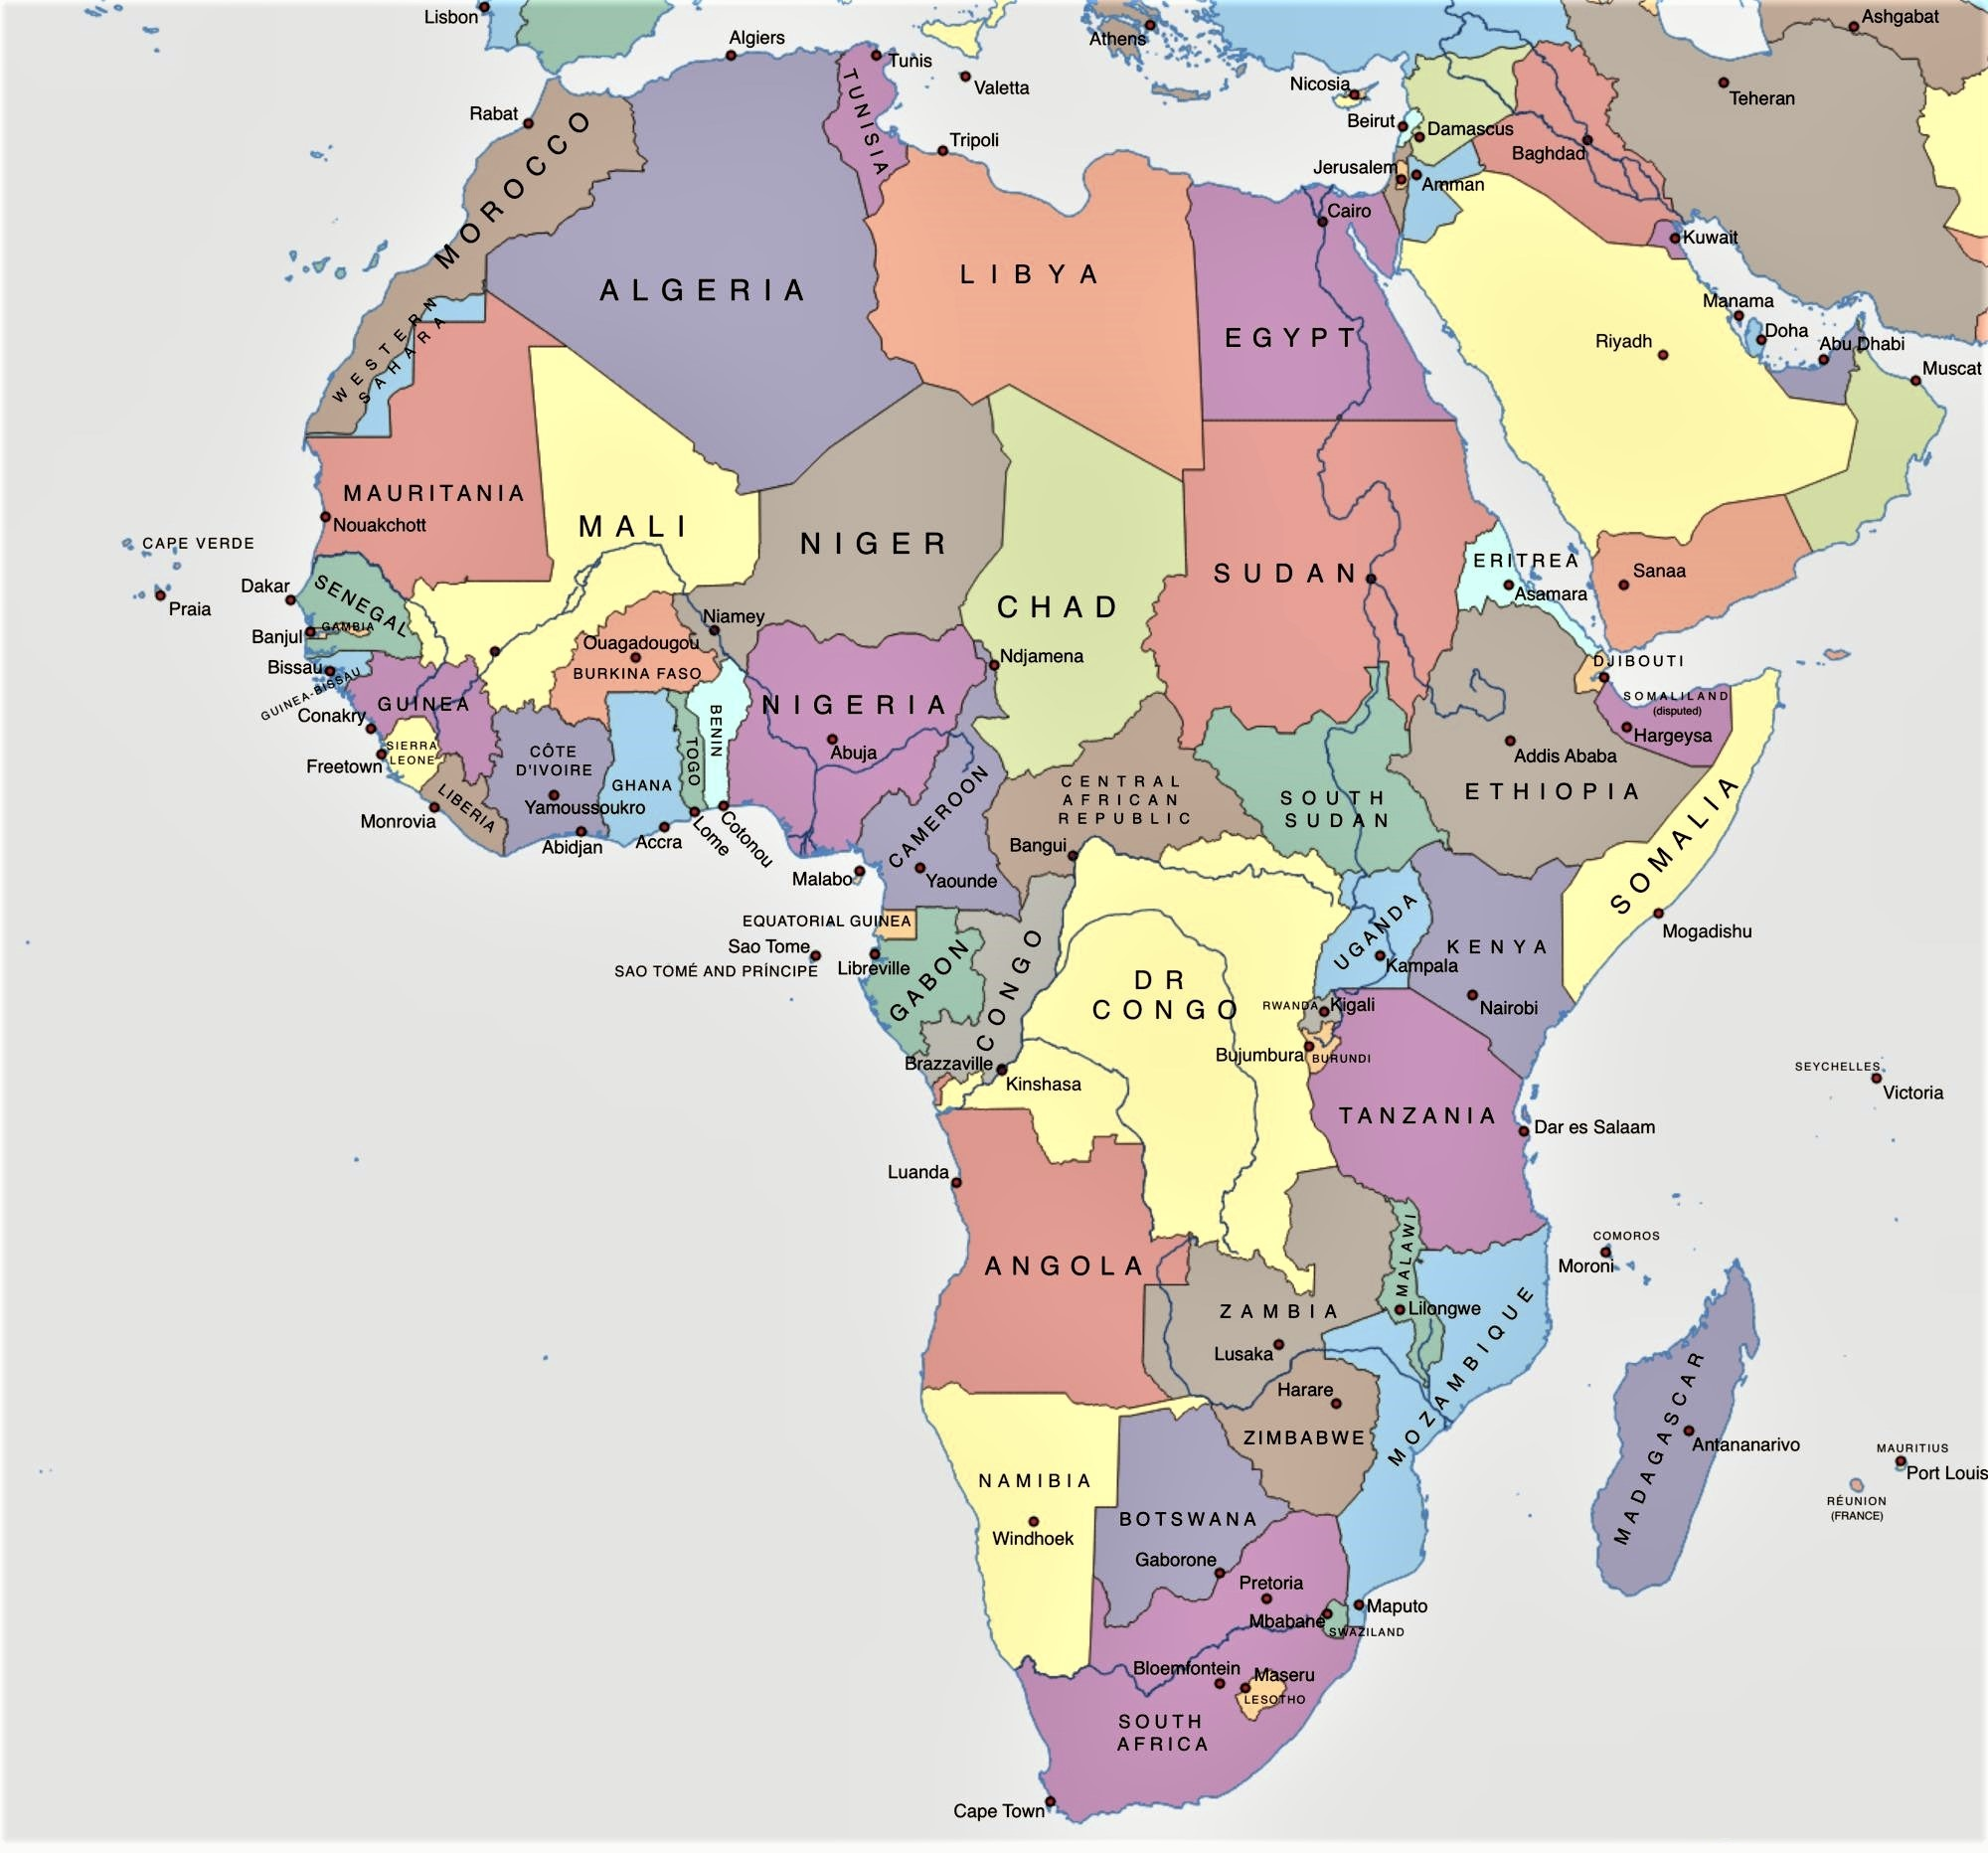 mapa politico africa con nombres